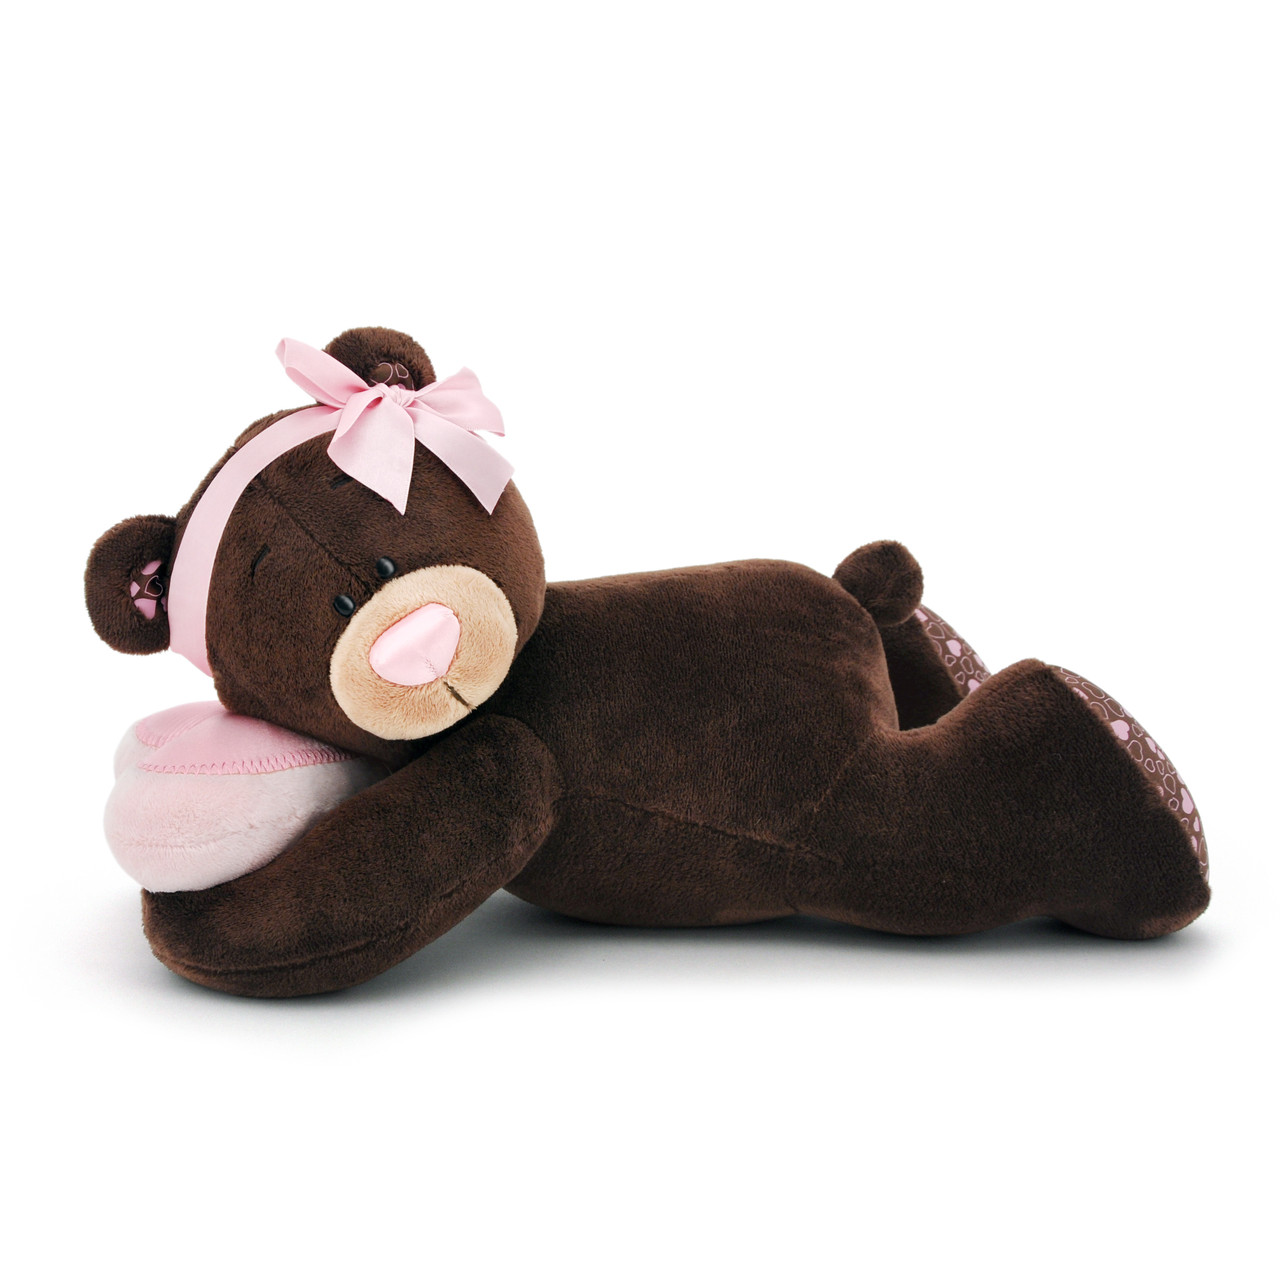 Мягкая игрушка «Orange» (M001/30) медвежонок Milk лежебока, 30 см